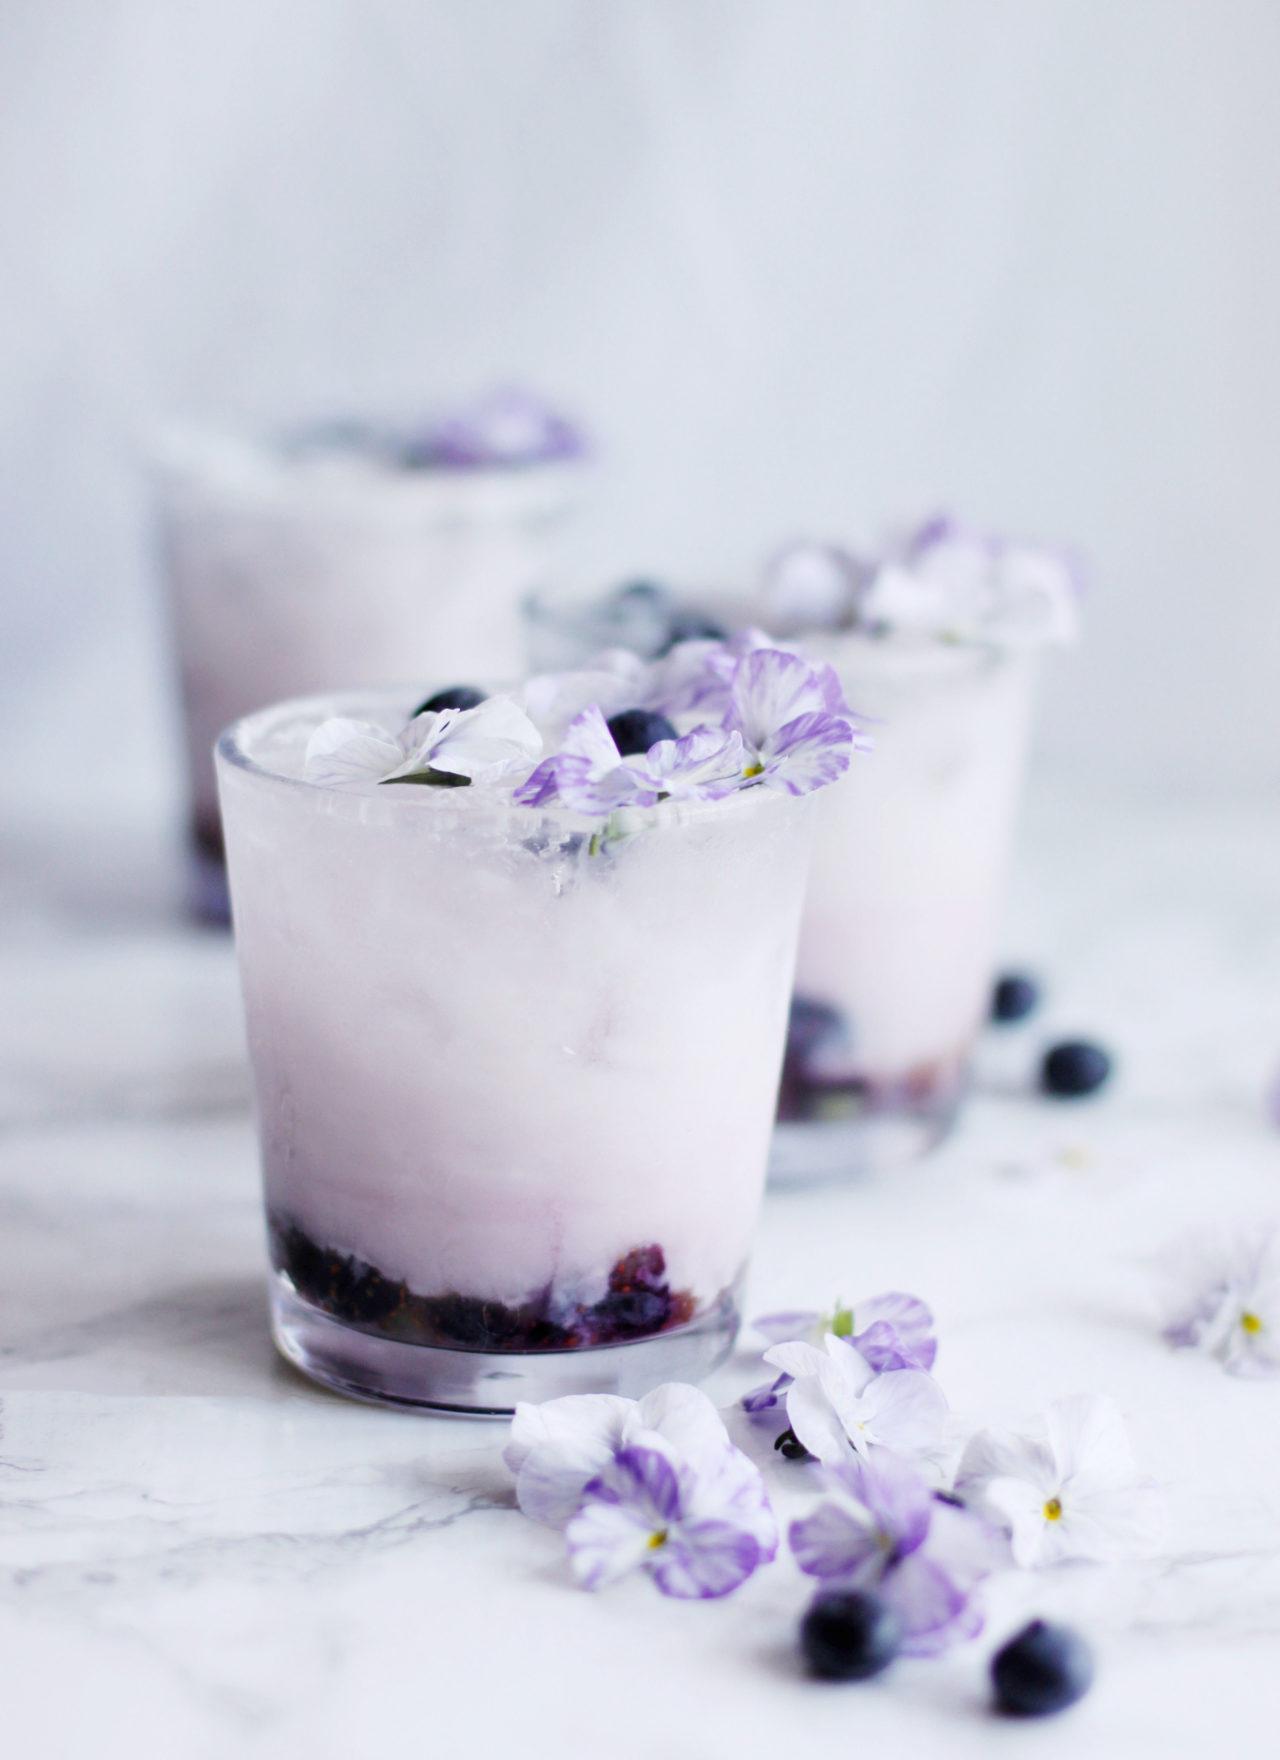 Tropical Blueberry Smash